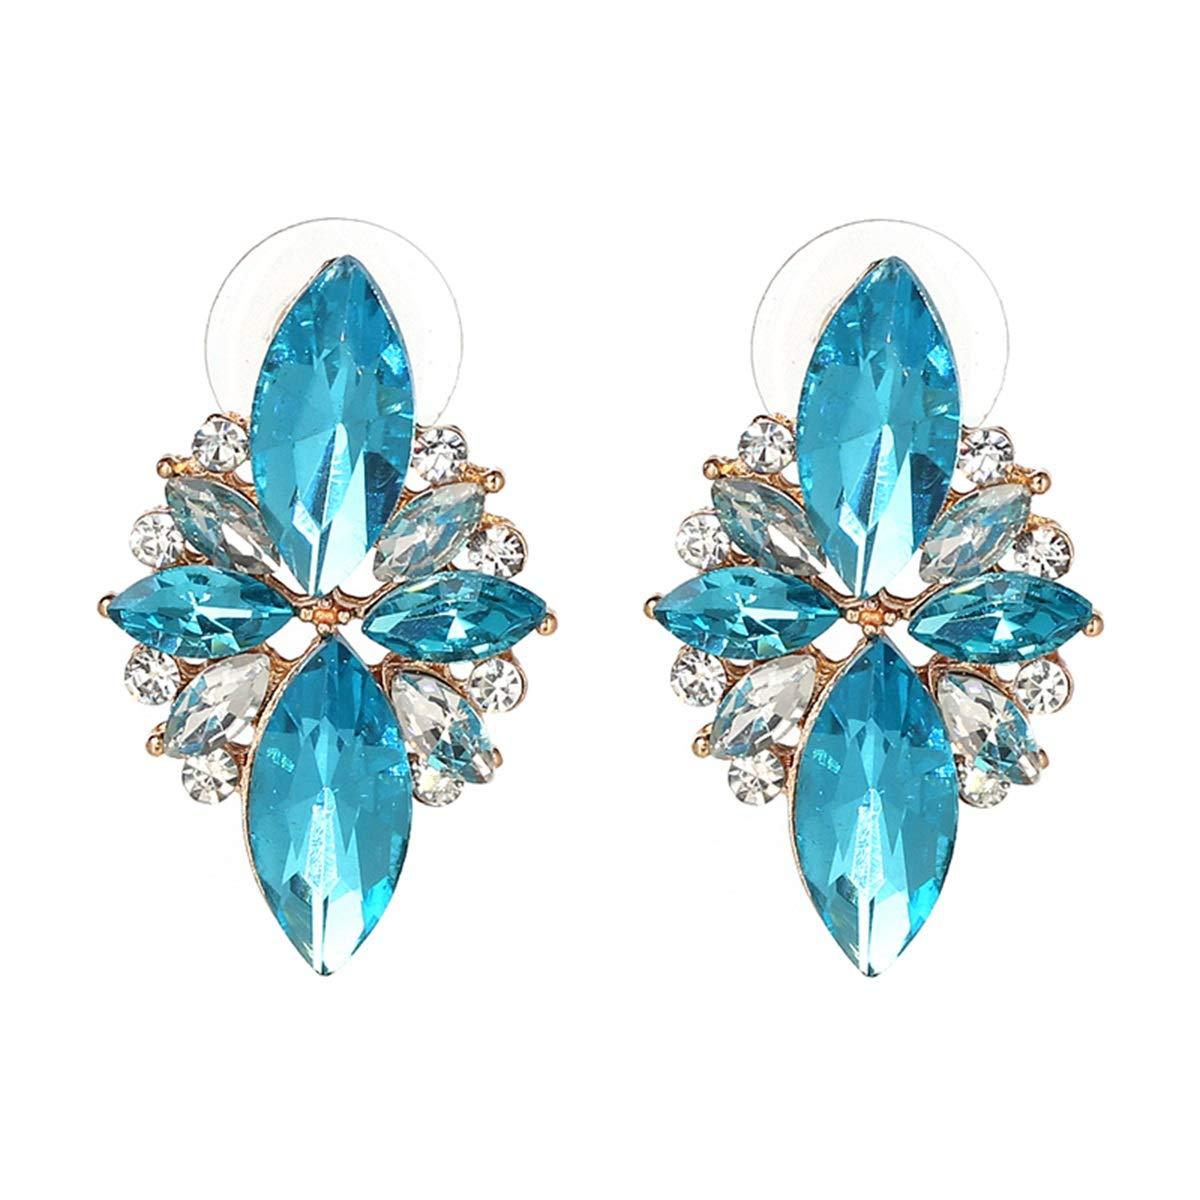 Liliynice 4 Colors New Fashion HOT Women Stud Earrings Crystal Vintage Korean Earrings Trendy Cute Lovely Drip Flower Shiny Wholesale